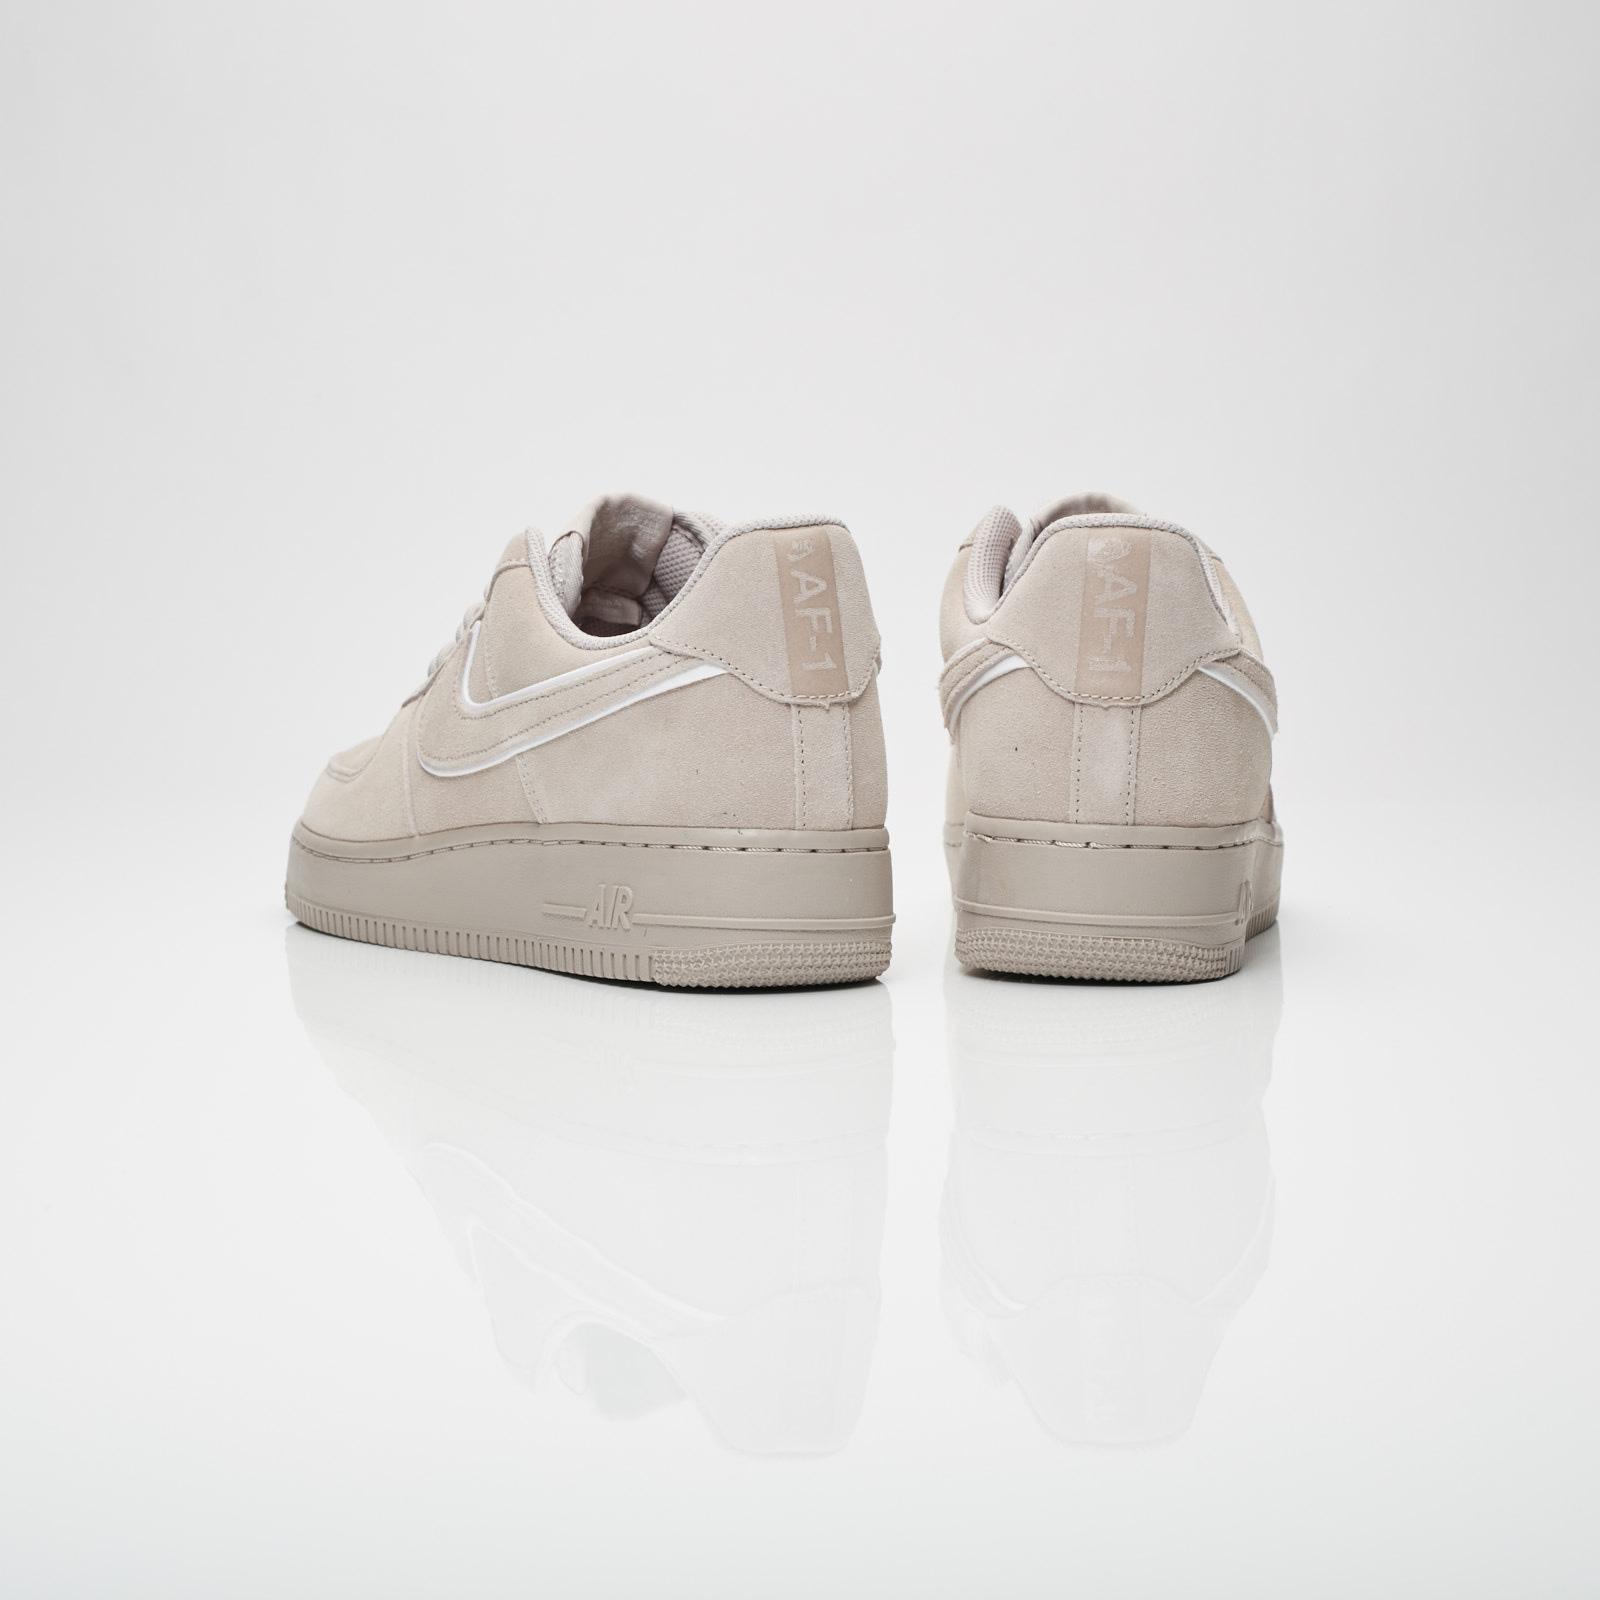 805324de3deba Nike Air Force 1 07 lv8 Suede - Aa1117-201 - Sneakersnstuff   sneakers &  streetwear online since 1999